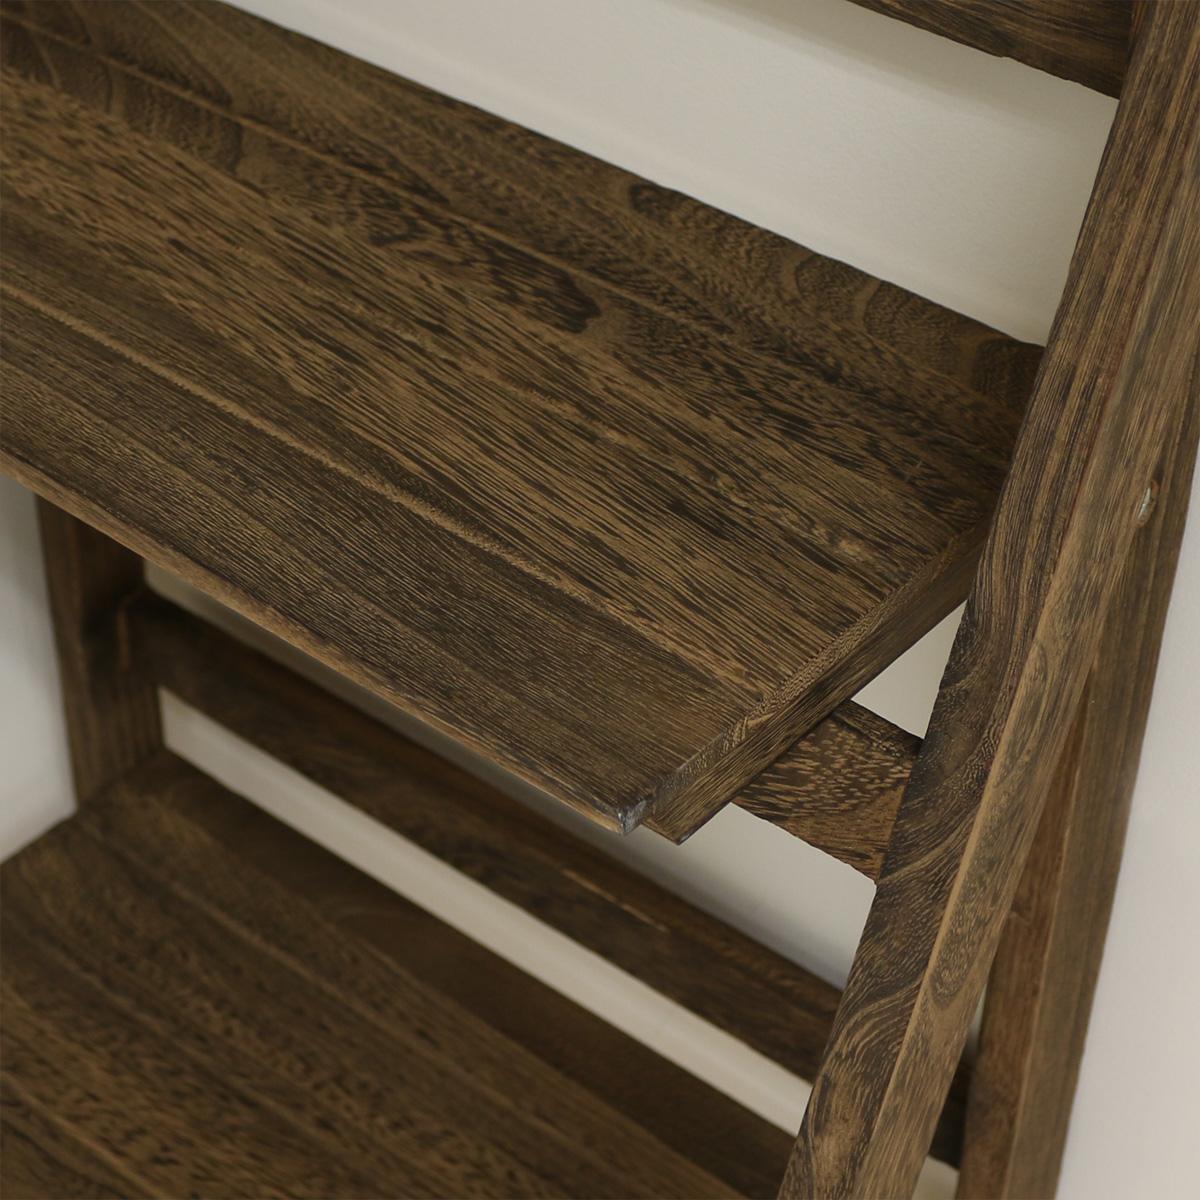 4 Tier Brown Ladder Shelf Display Unit Free Standing